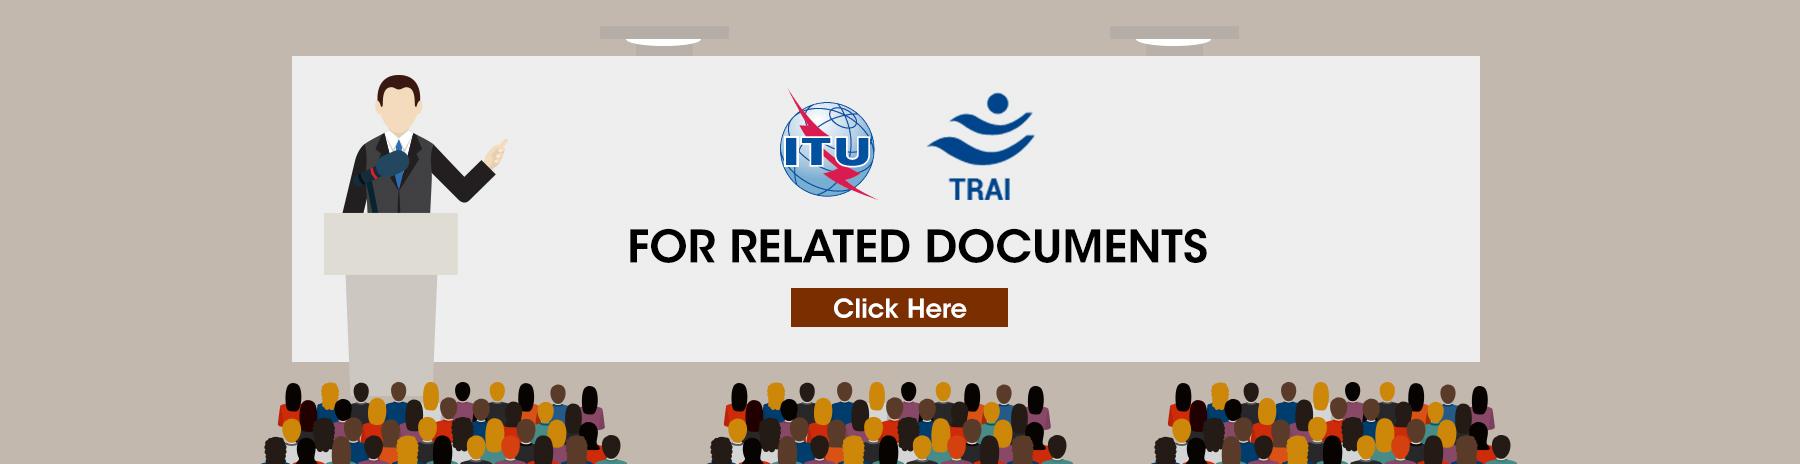 TRA ITU Roundtable